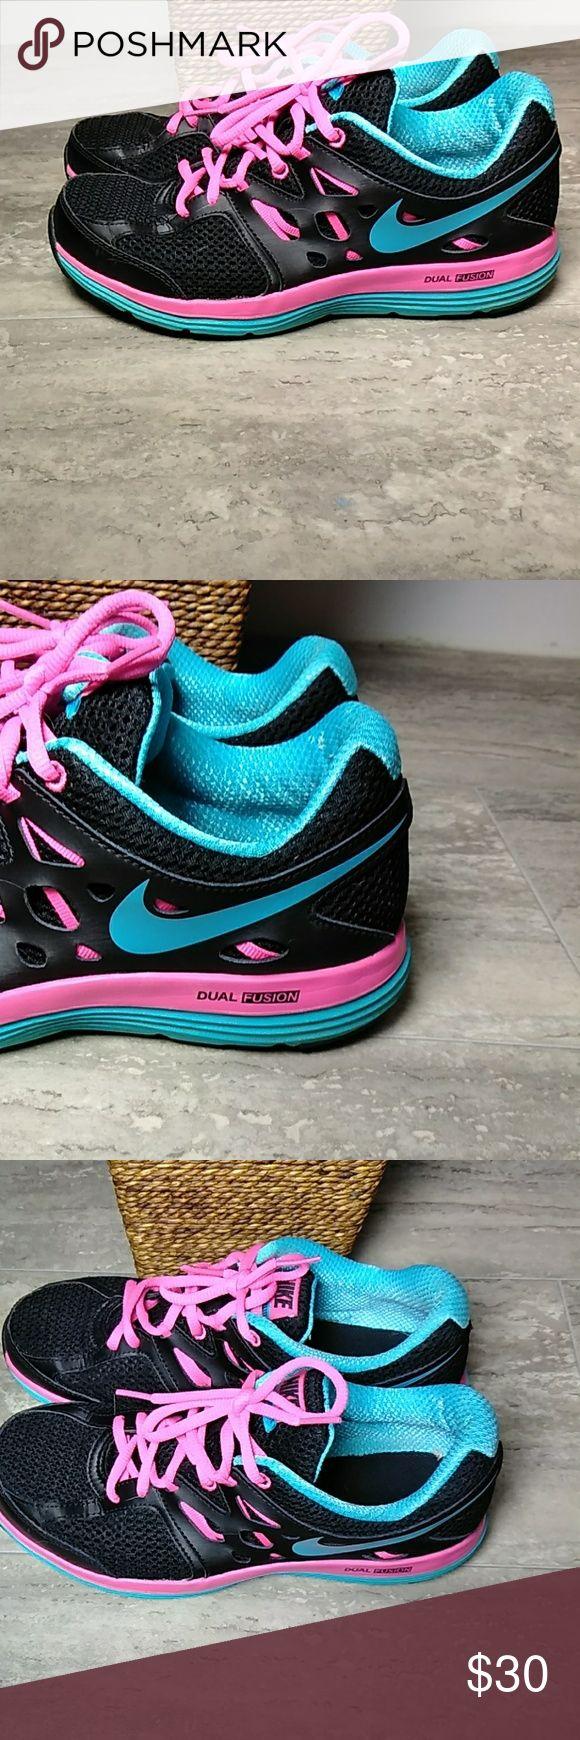 Nike Dual Fusion Lite,  size 8, like new! Nike Dual Fusion Lite,  size 8, like new! Nike Shoes Athletic Shoes